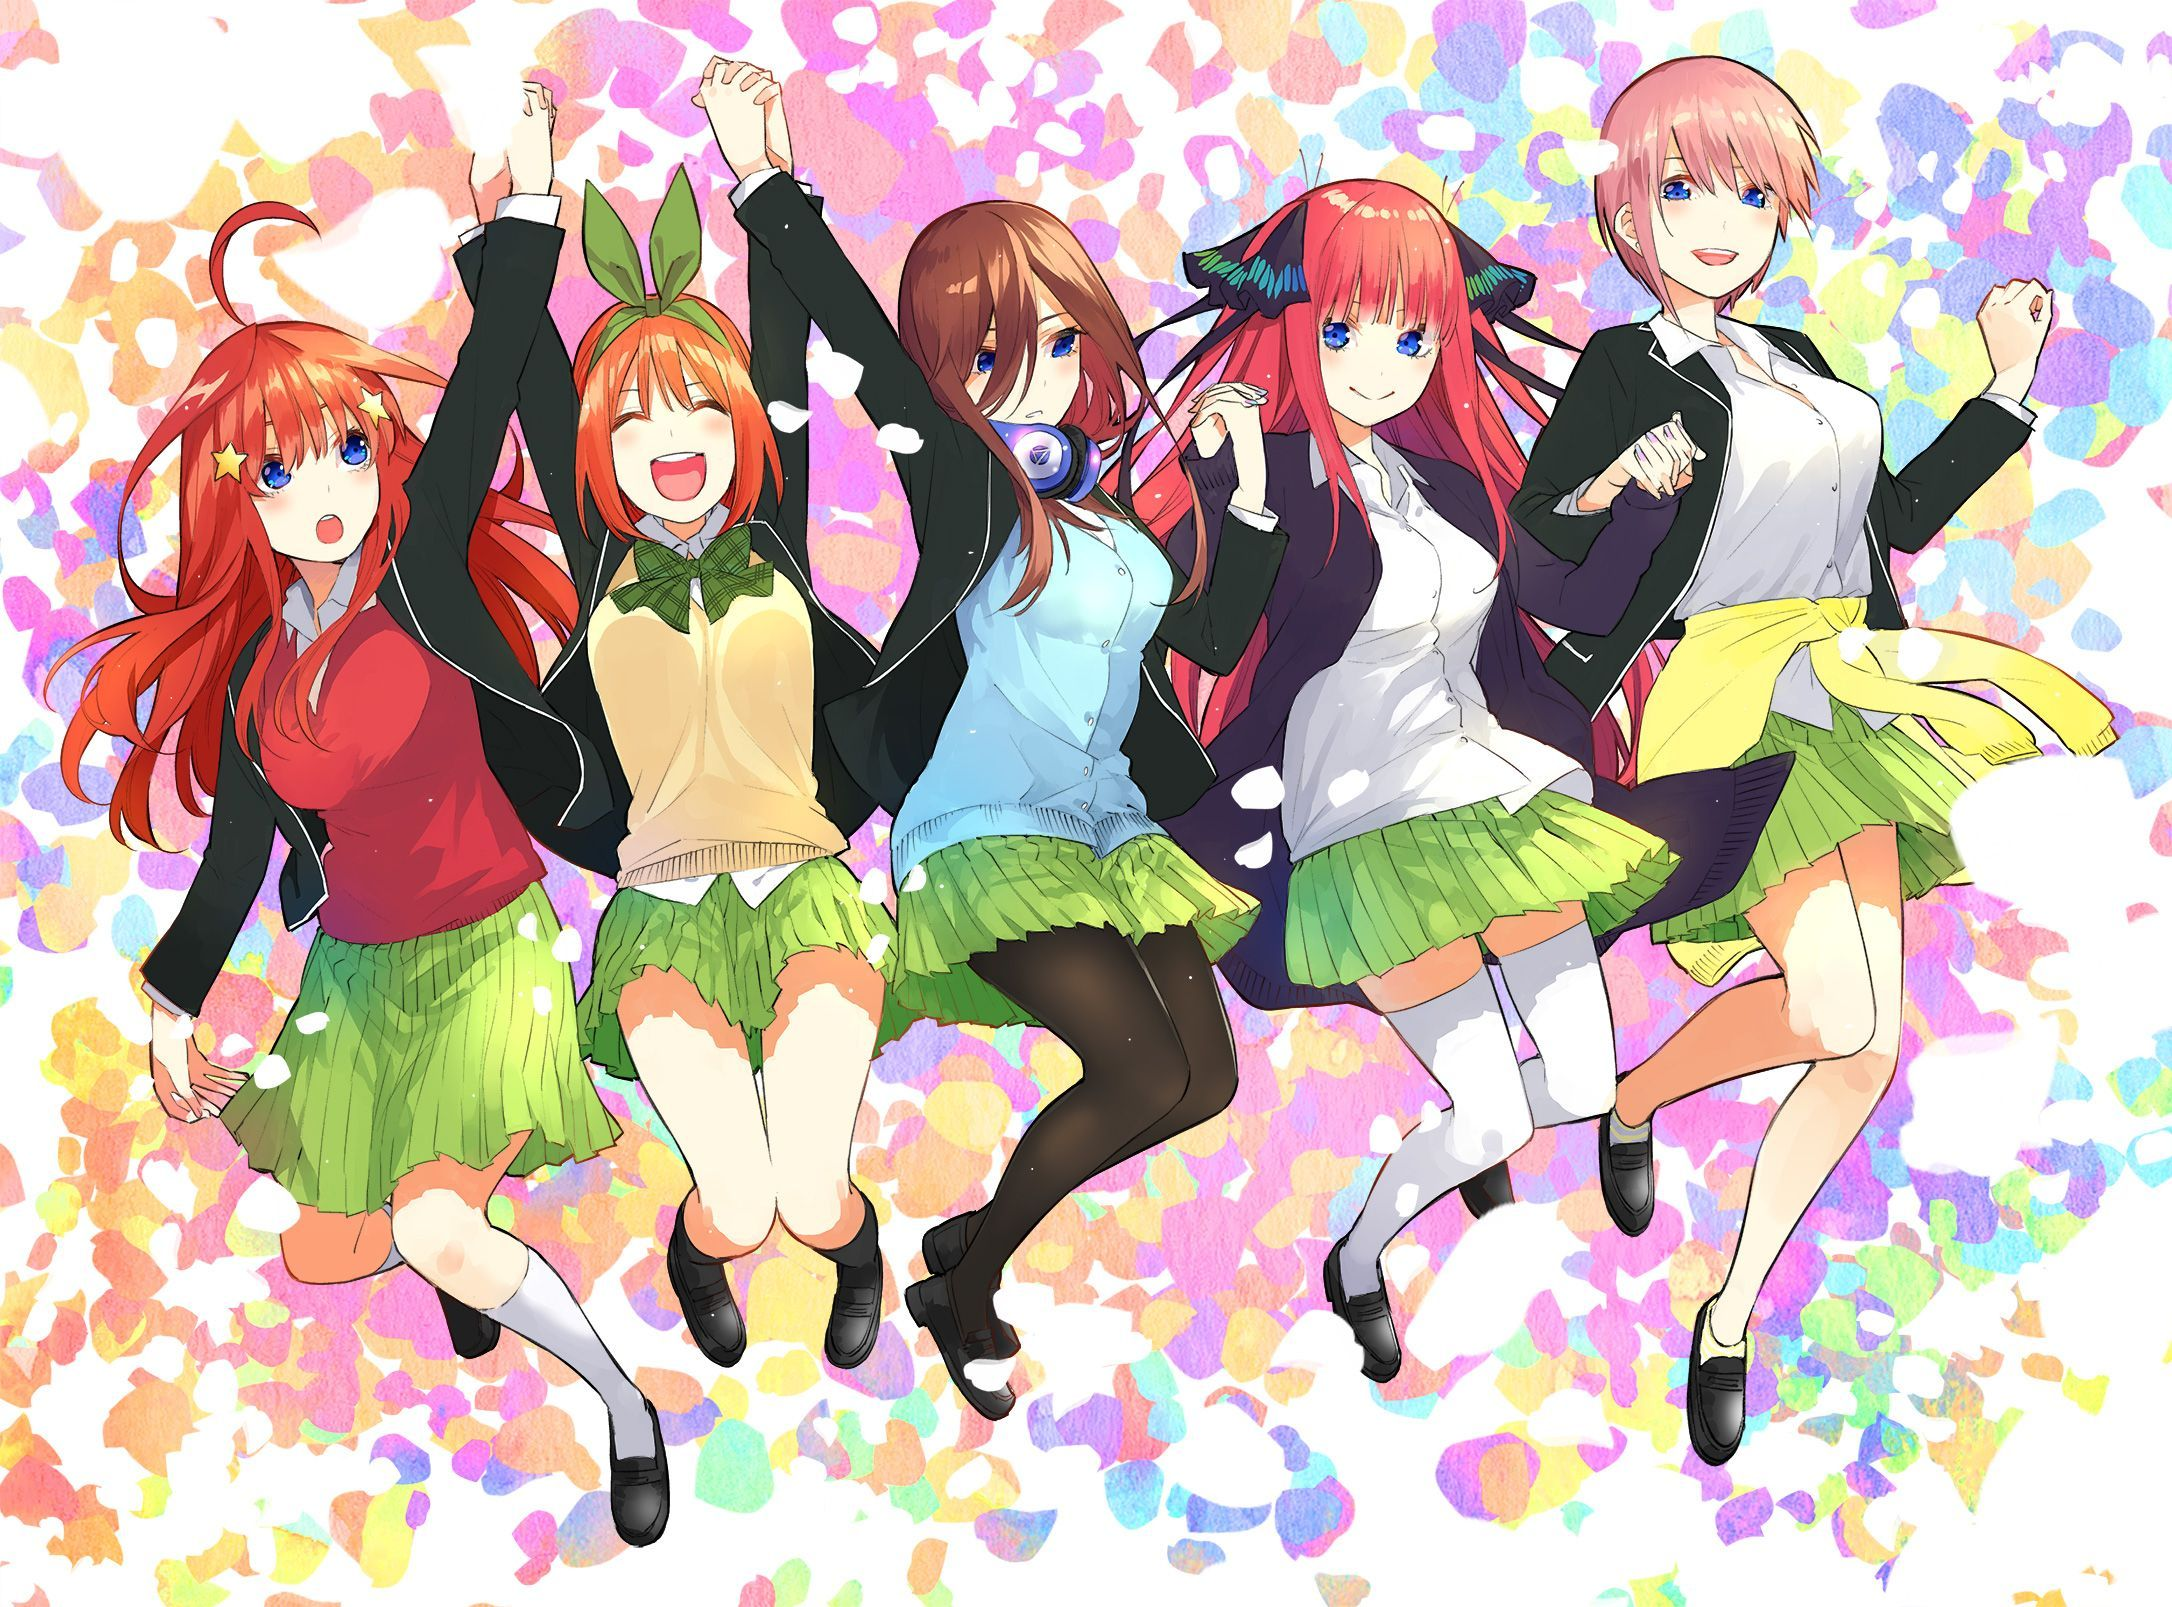 browse daily anime manga photos and news and join a community of anime lovers personajes de anime dibujos de anime arte de anime